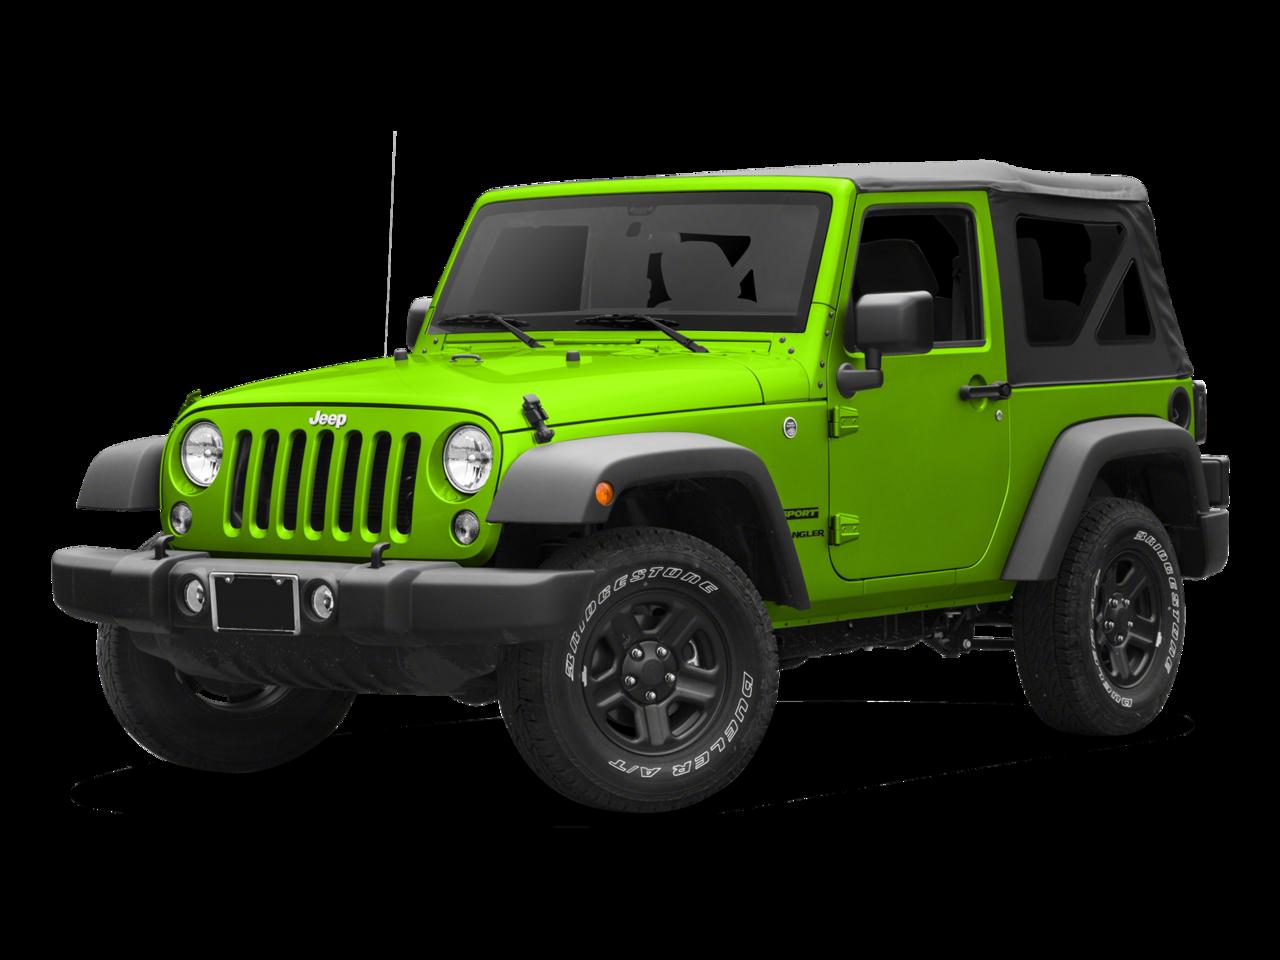 2017 Jeep Wrangler   Rothrock Motors   Allentown PA